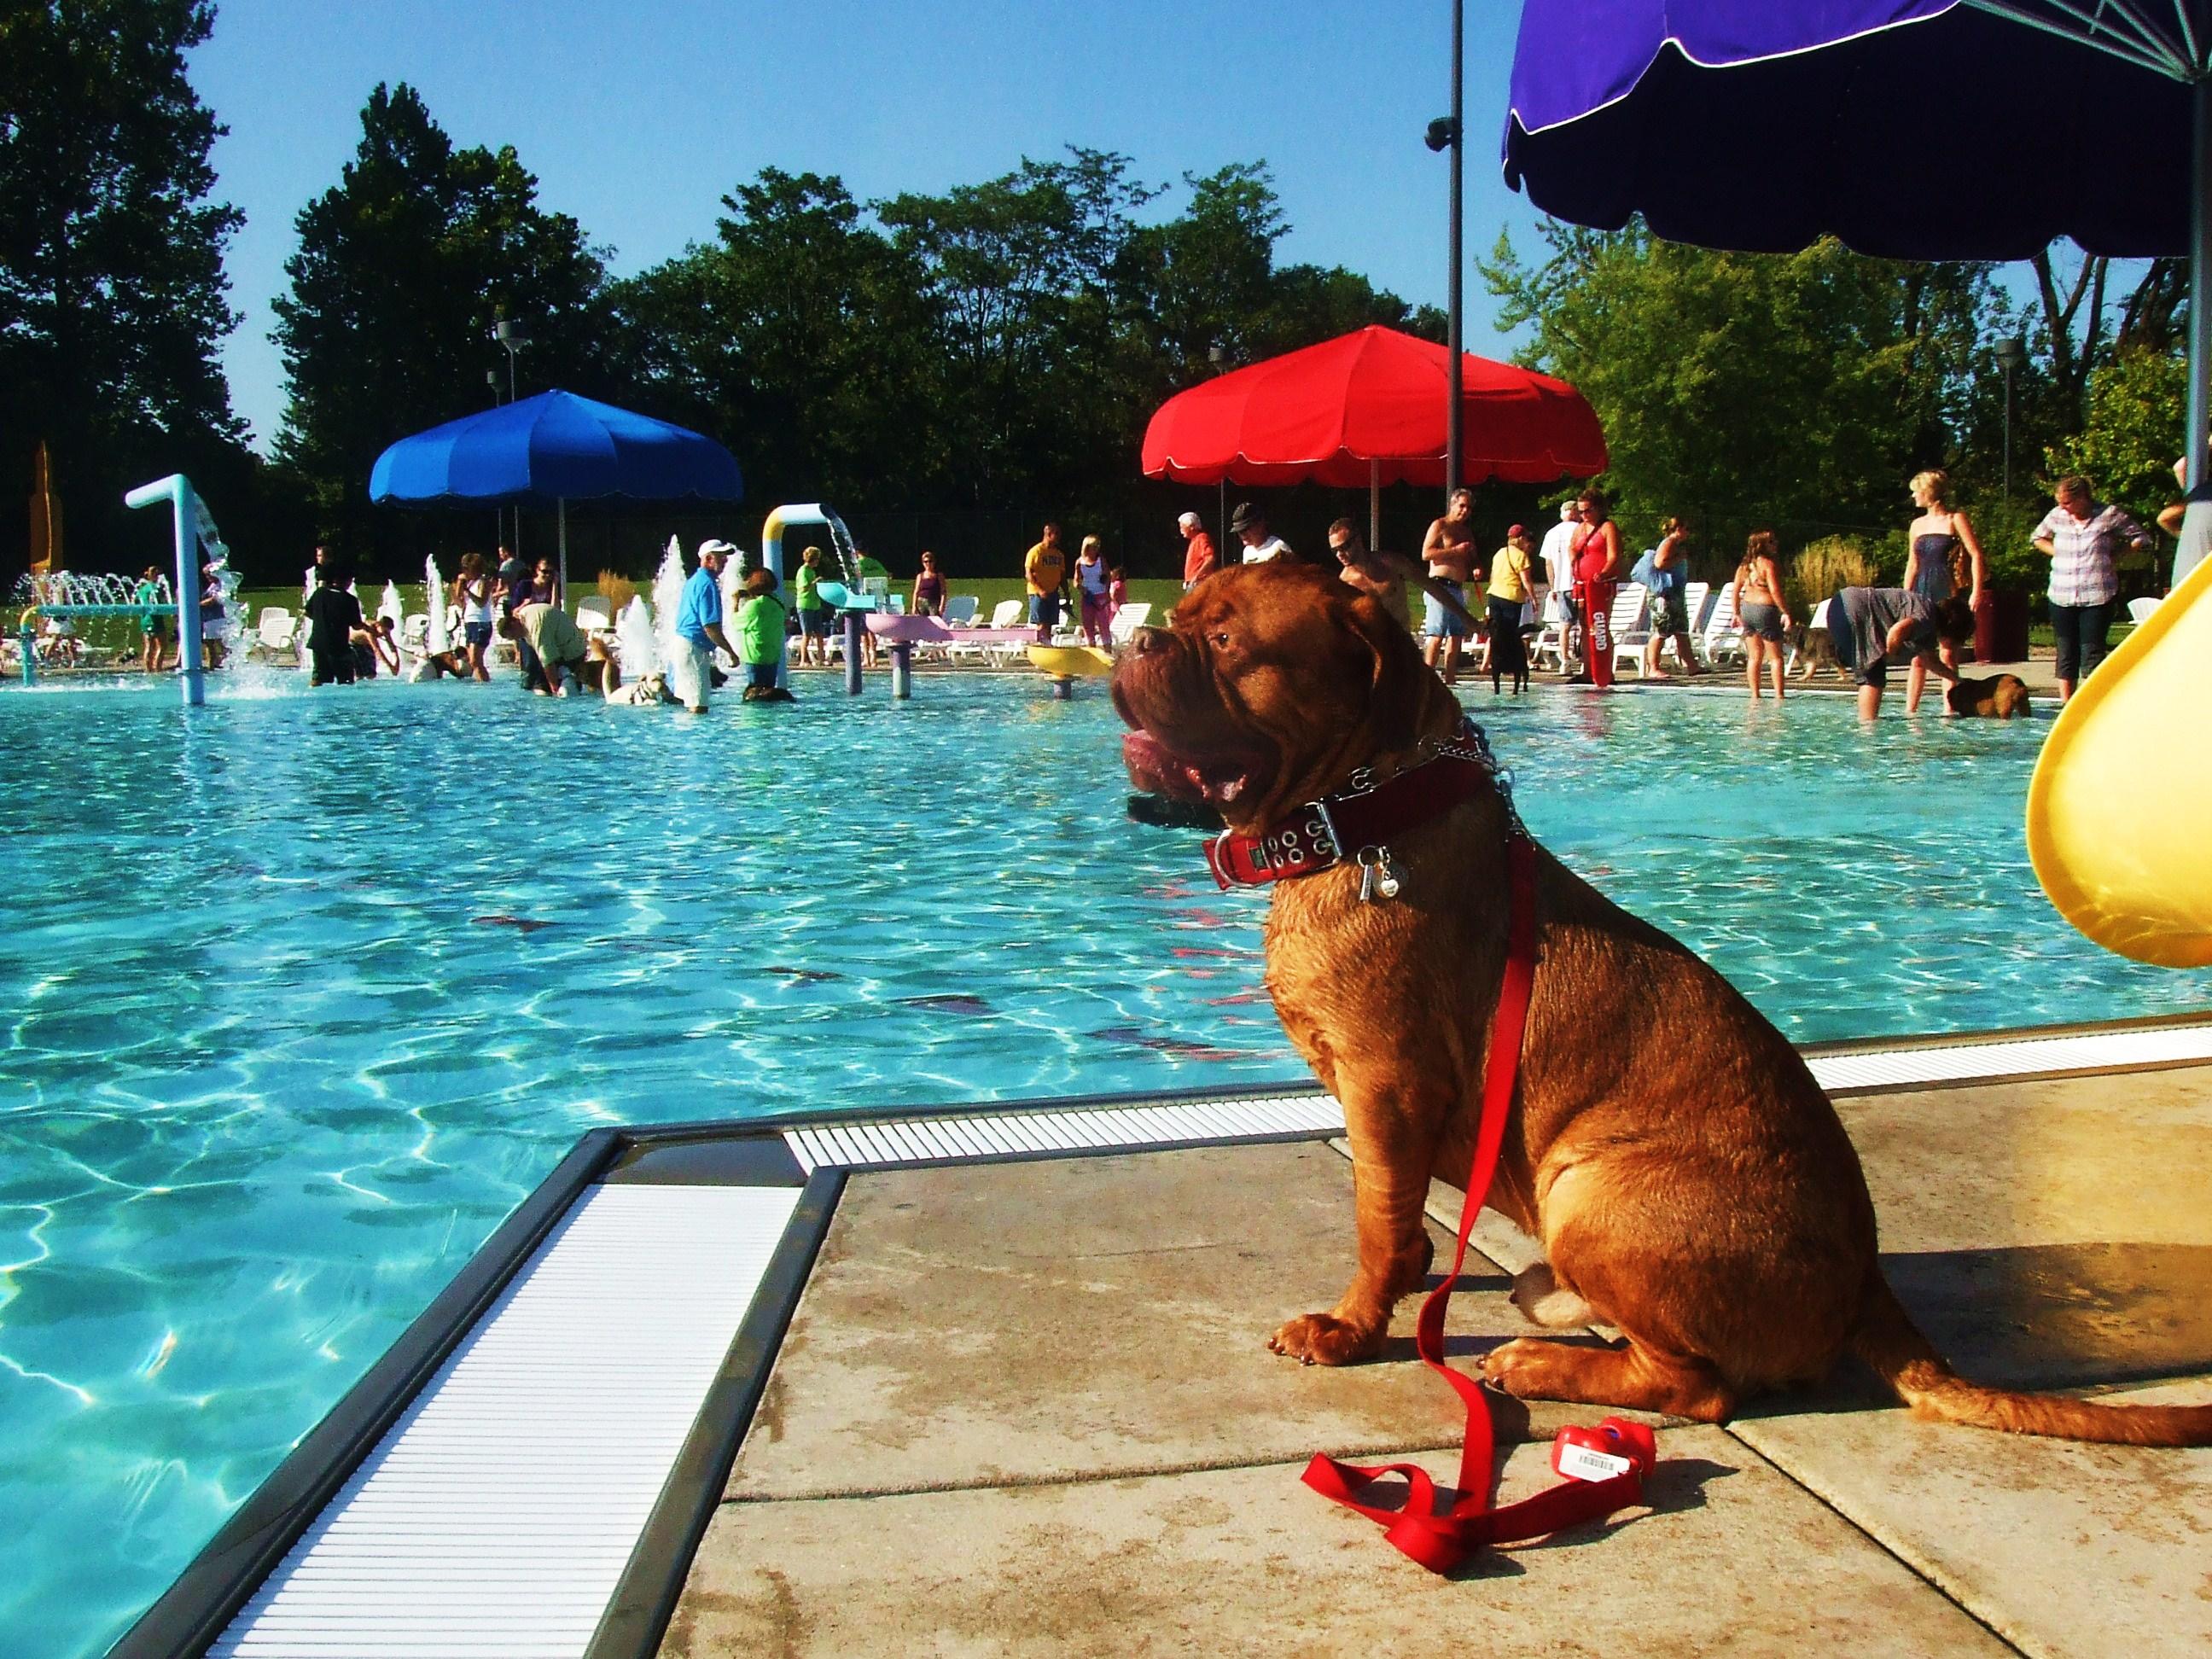 do all dogs know how to swim